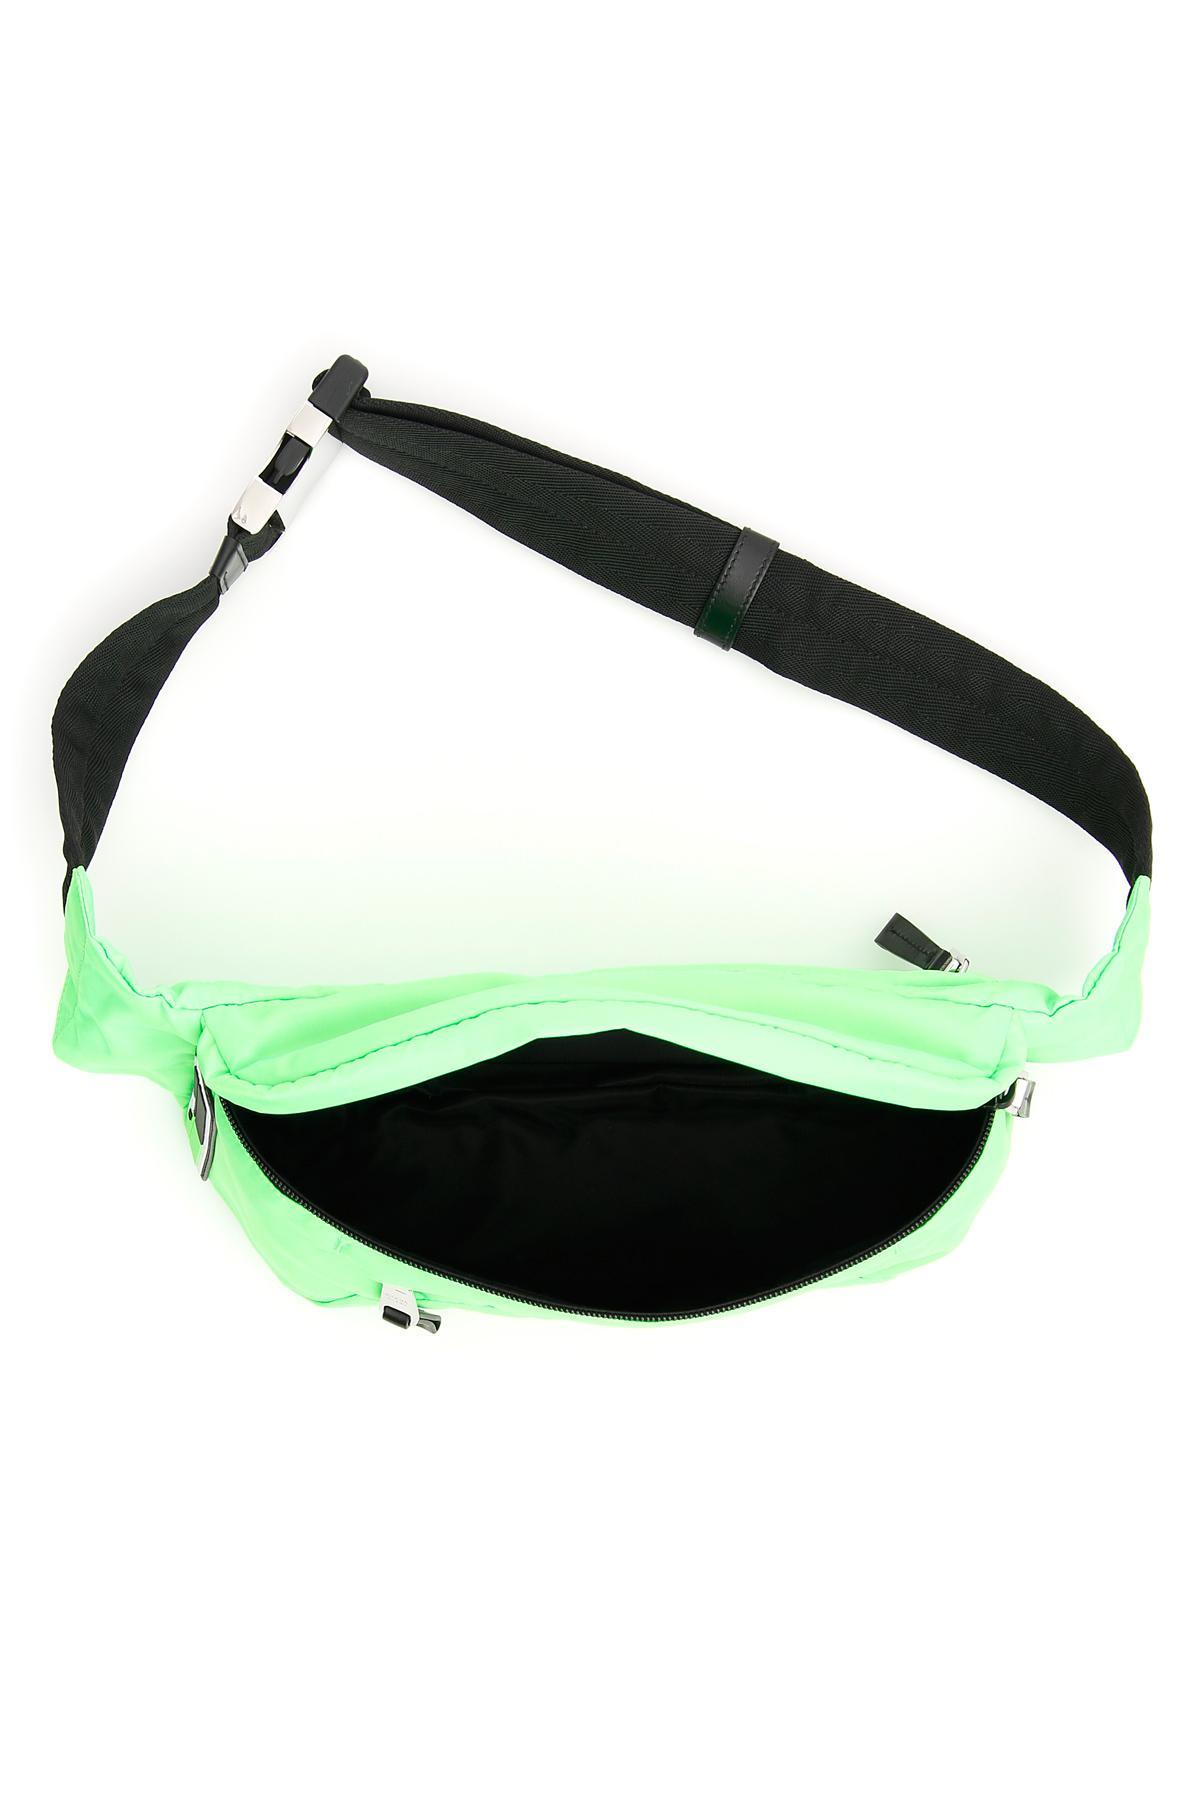 08baaf8fb6e5db Prada - Green Nylon Beltbag With Logo for Men - Lyst. View fullscreen